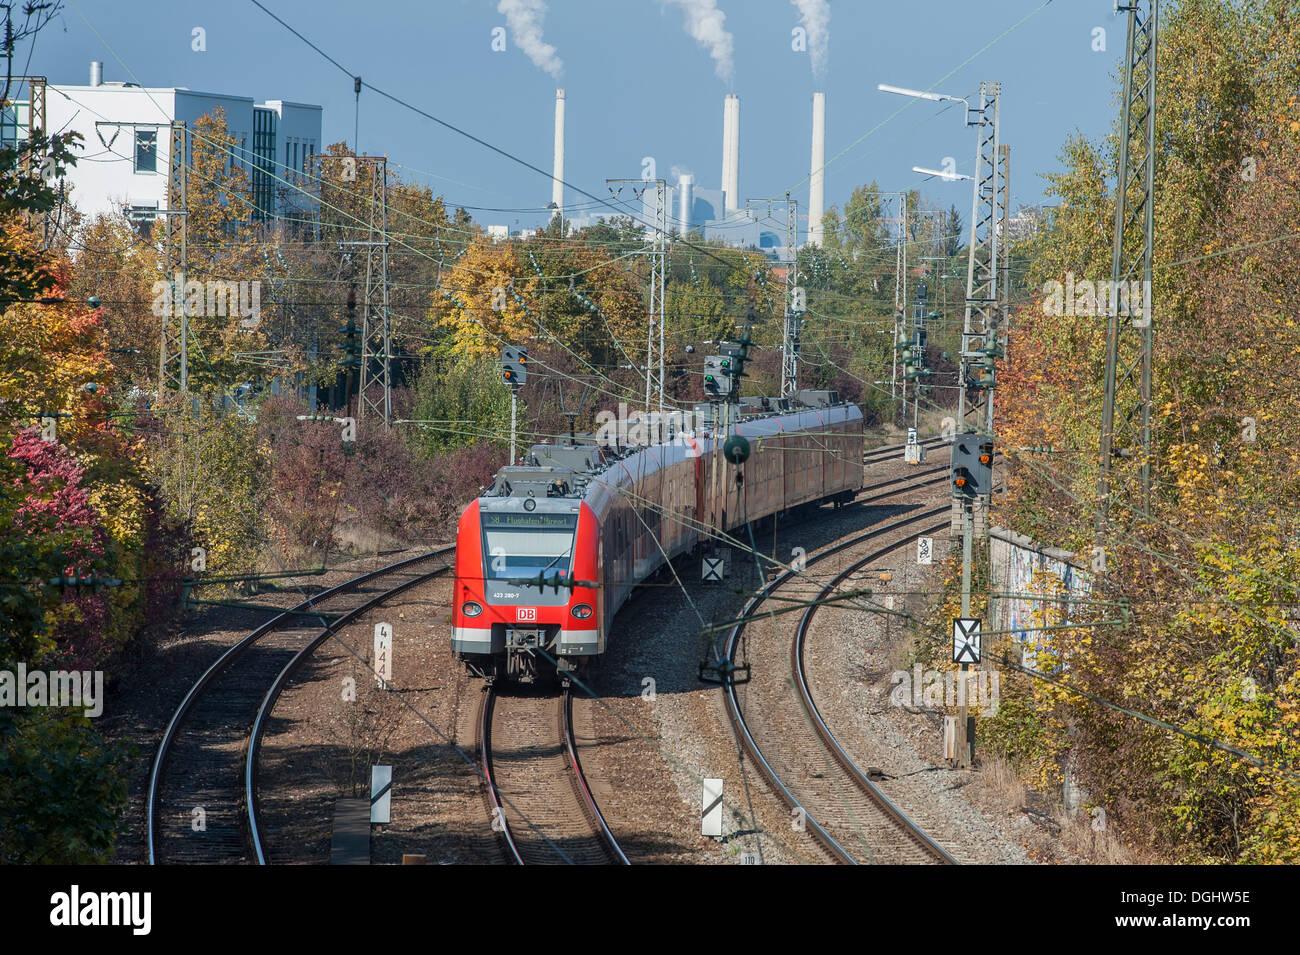 S-Bahn, suburban railway, driving on rail track near Daglfing, Munich, Bavaria Stock Photo